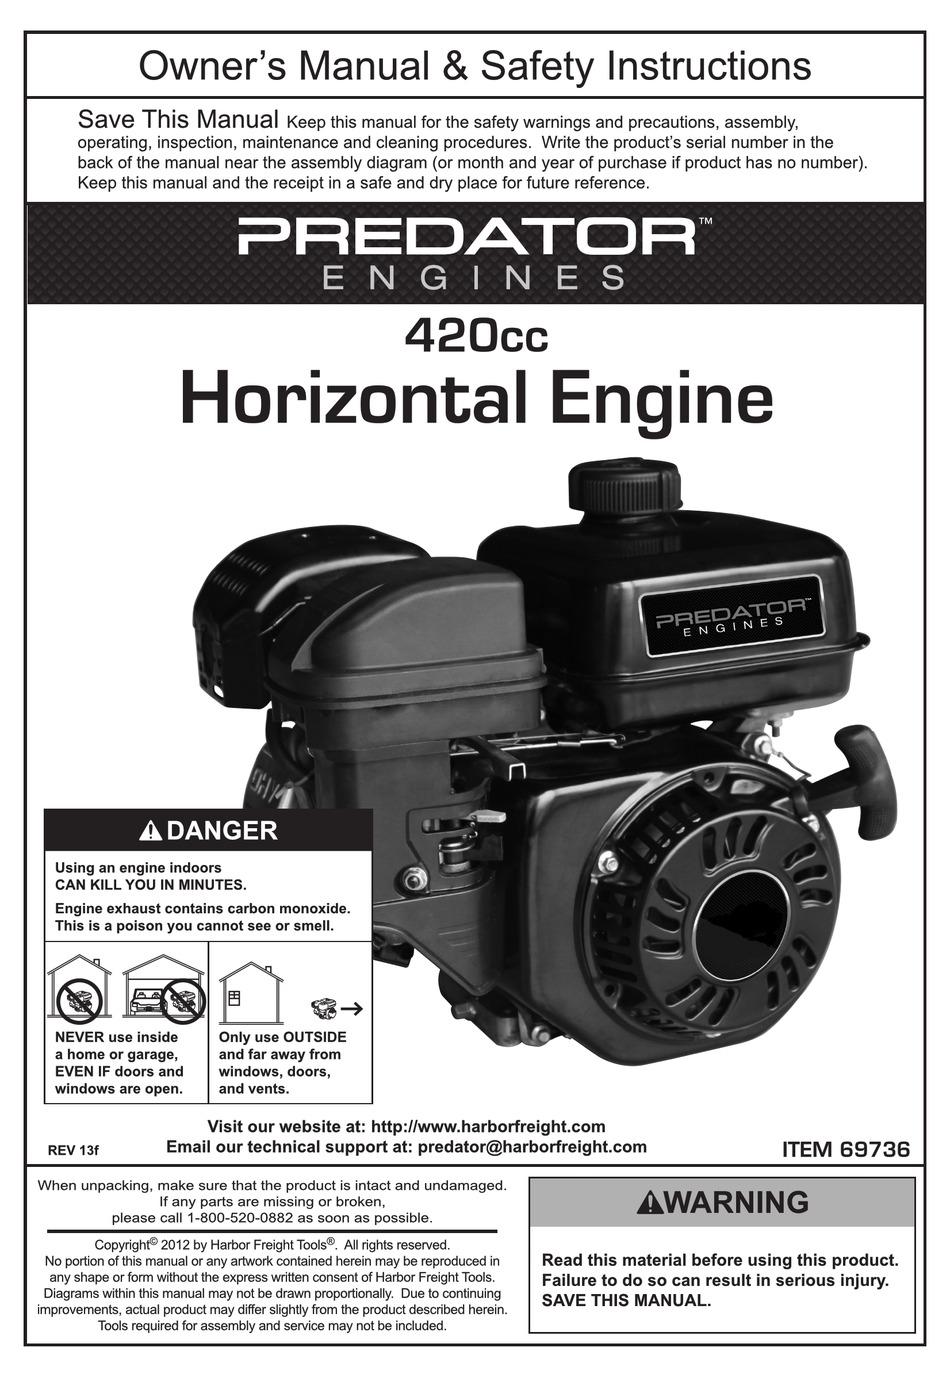 Predator Engines 420cc Owner S Manual Safety Instructions Pdf Download Manualslib